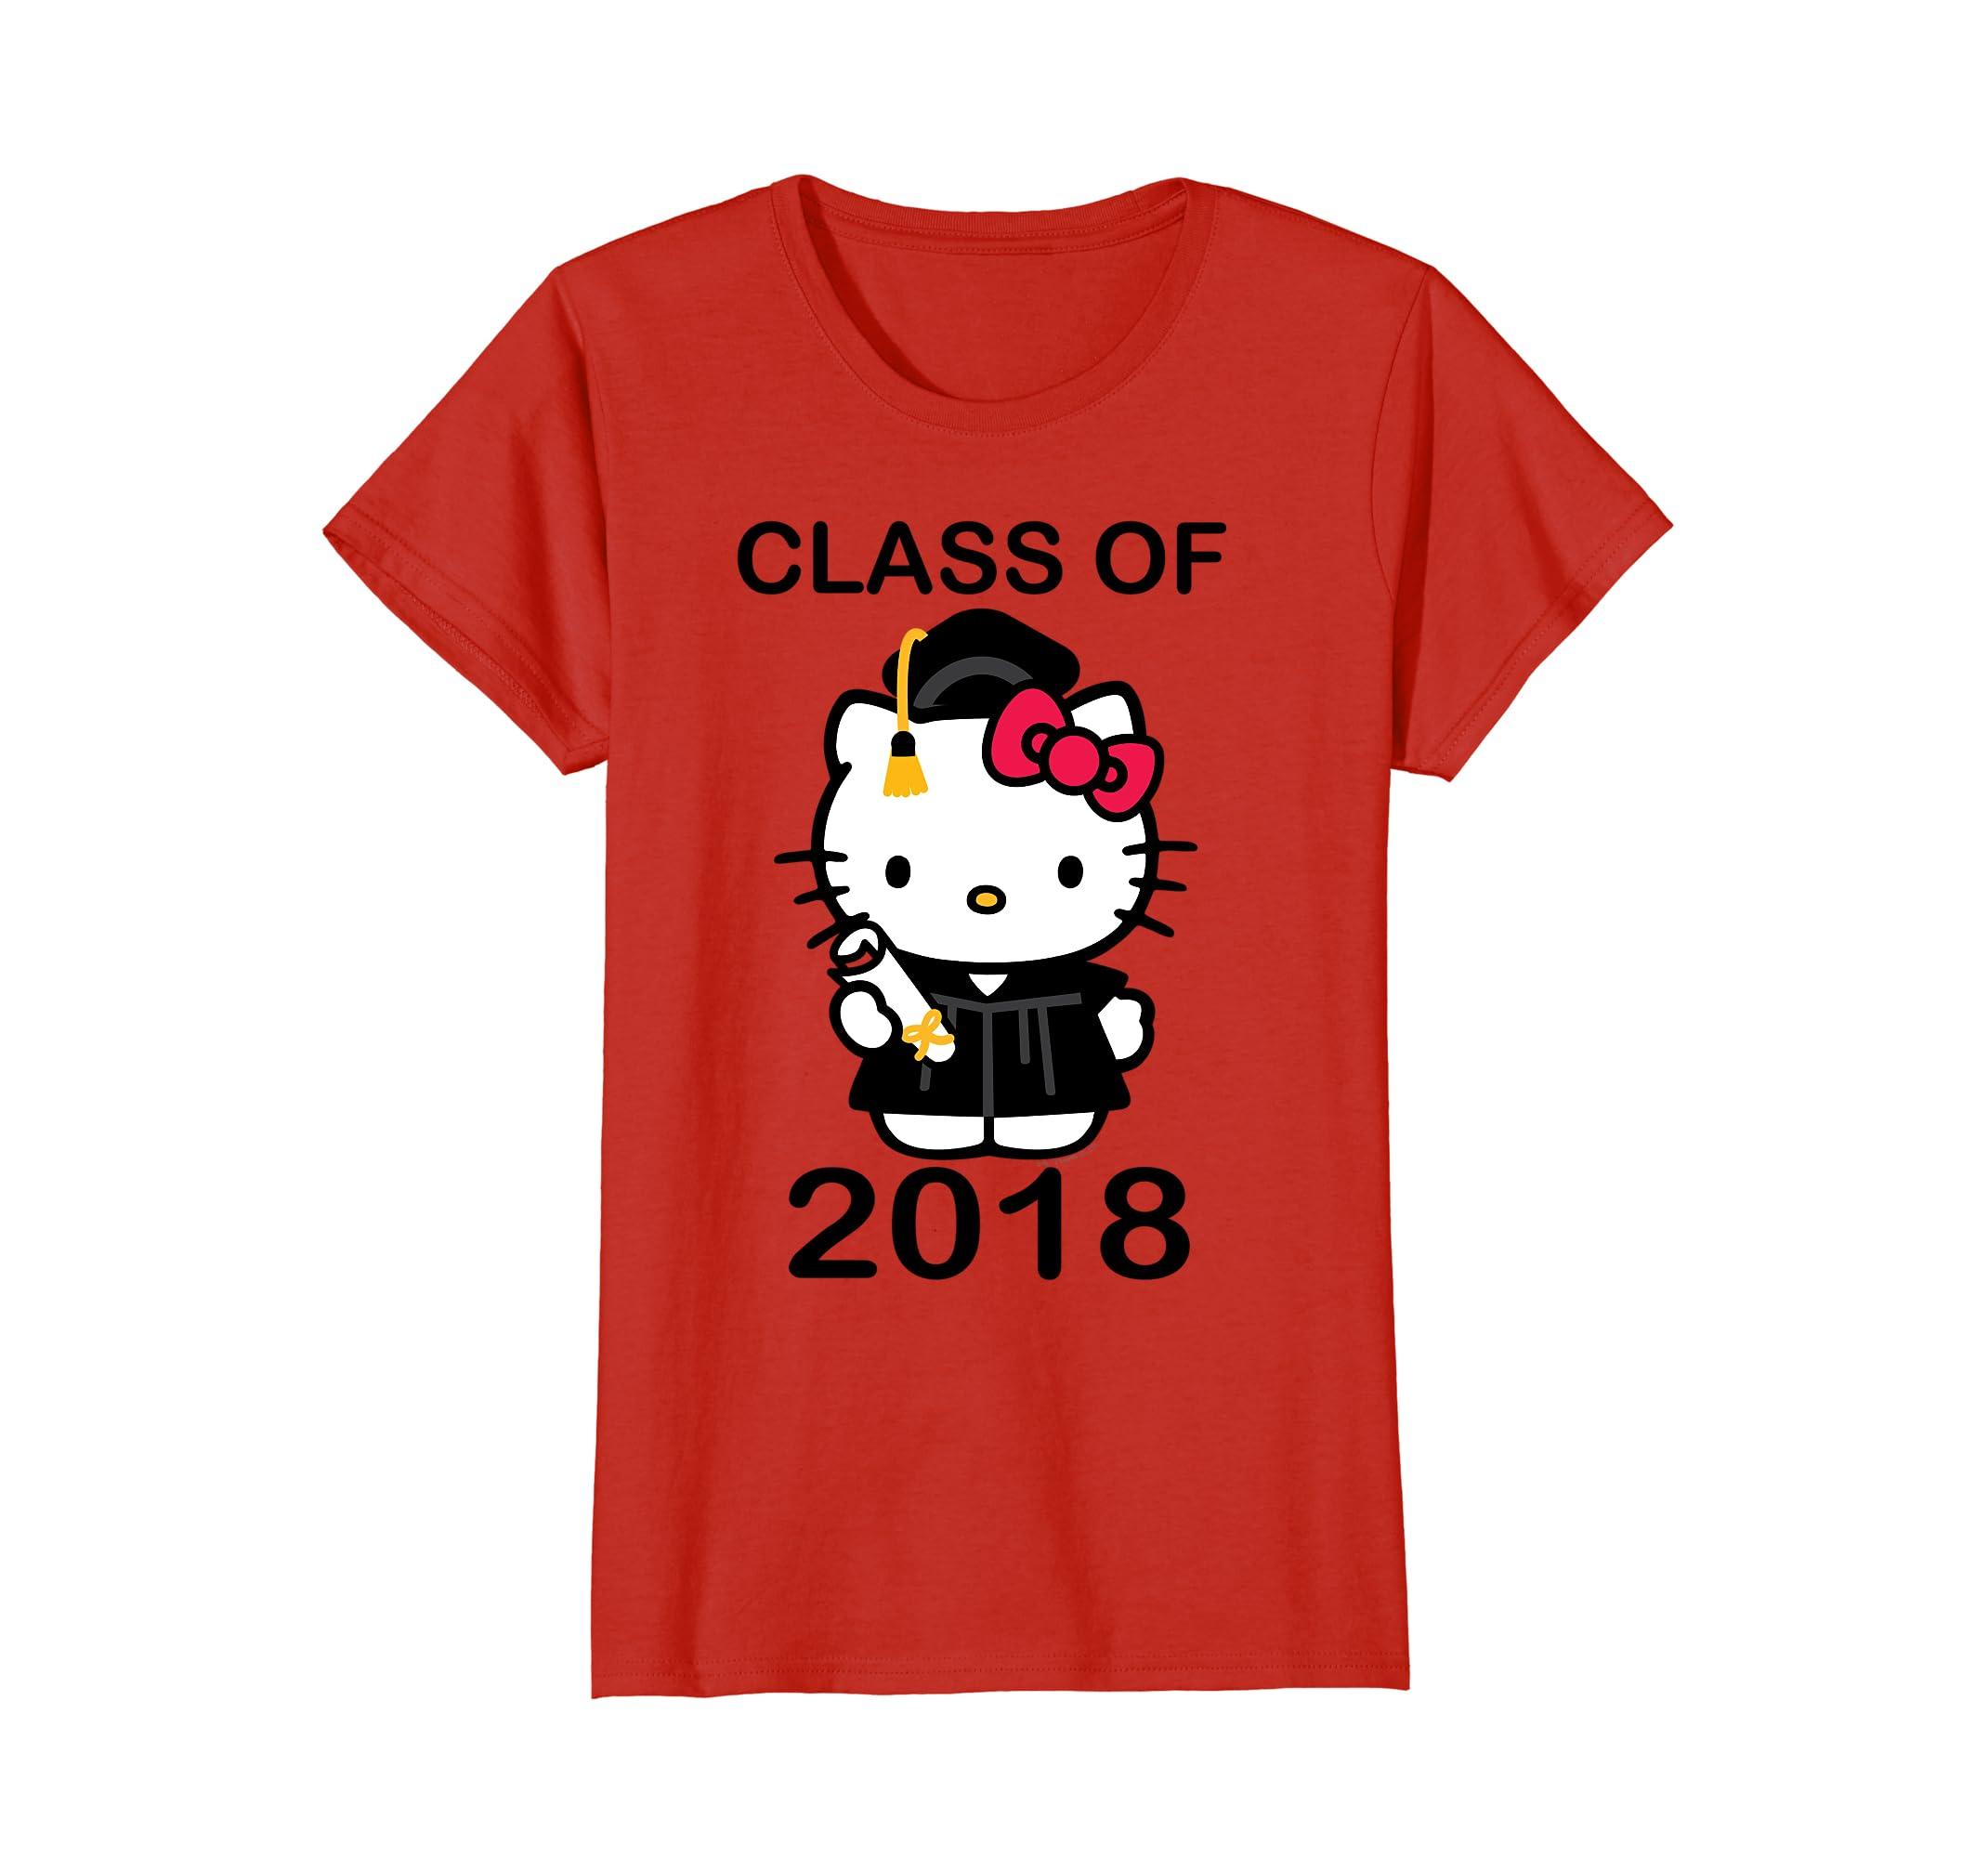 de268d320 Amazon.com: Hello Kitty Graduation Class of 2018 Tee Shirt: Clothing